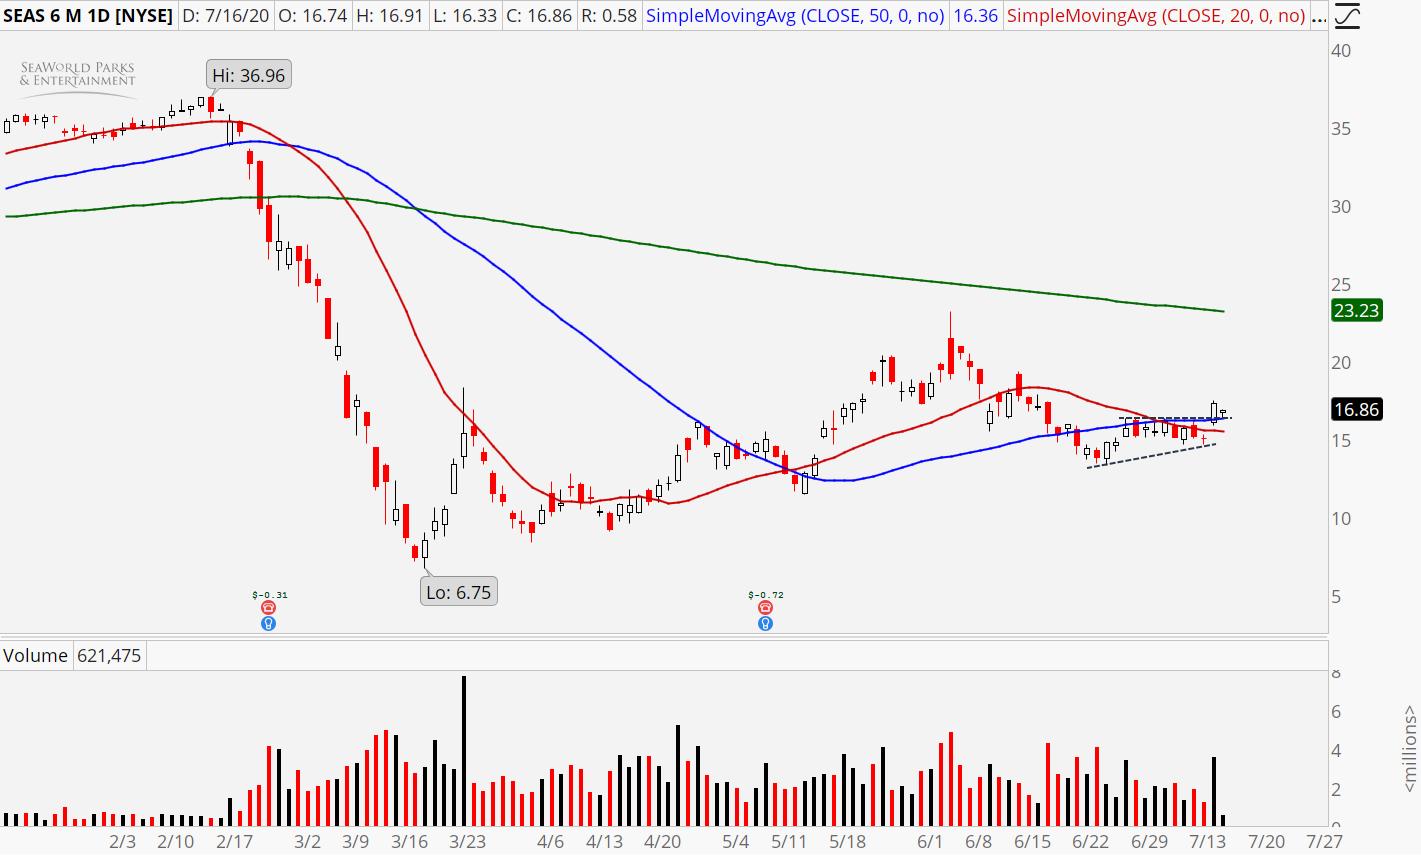 SeaWorld Entertainment (SEAS) stock chart showing powerful breakout